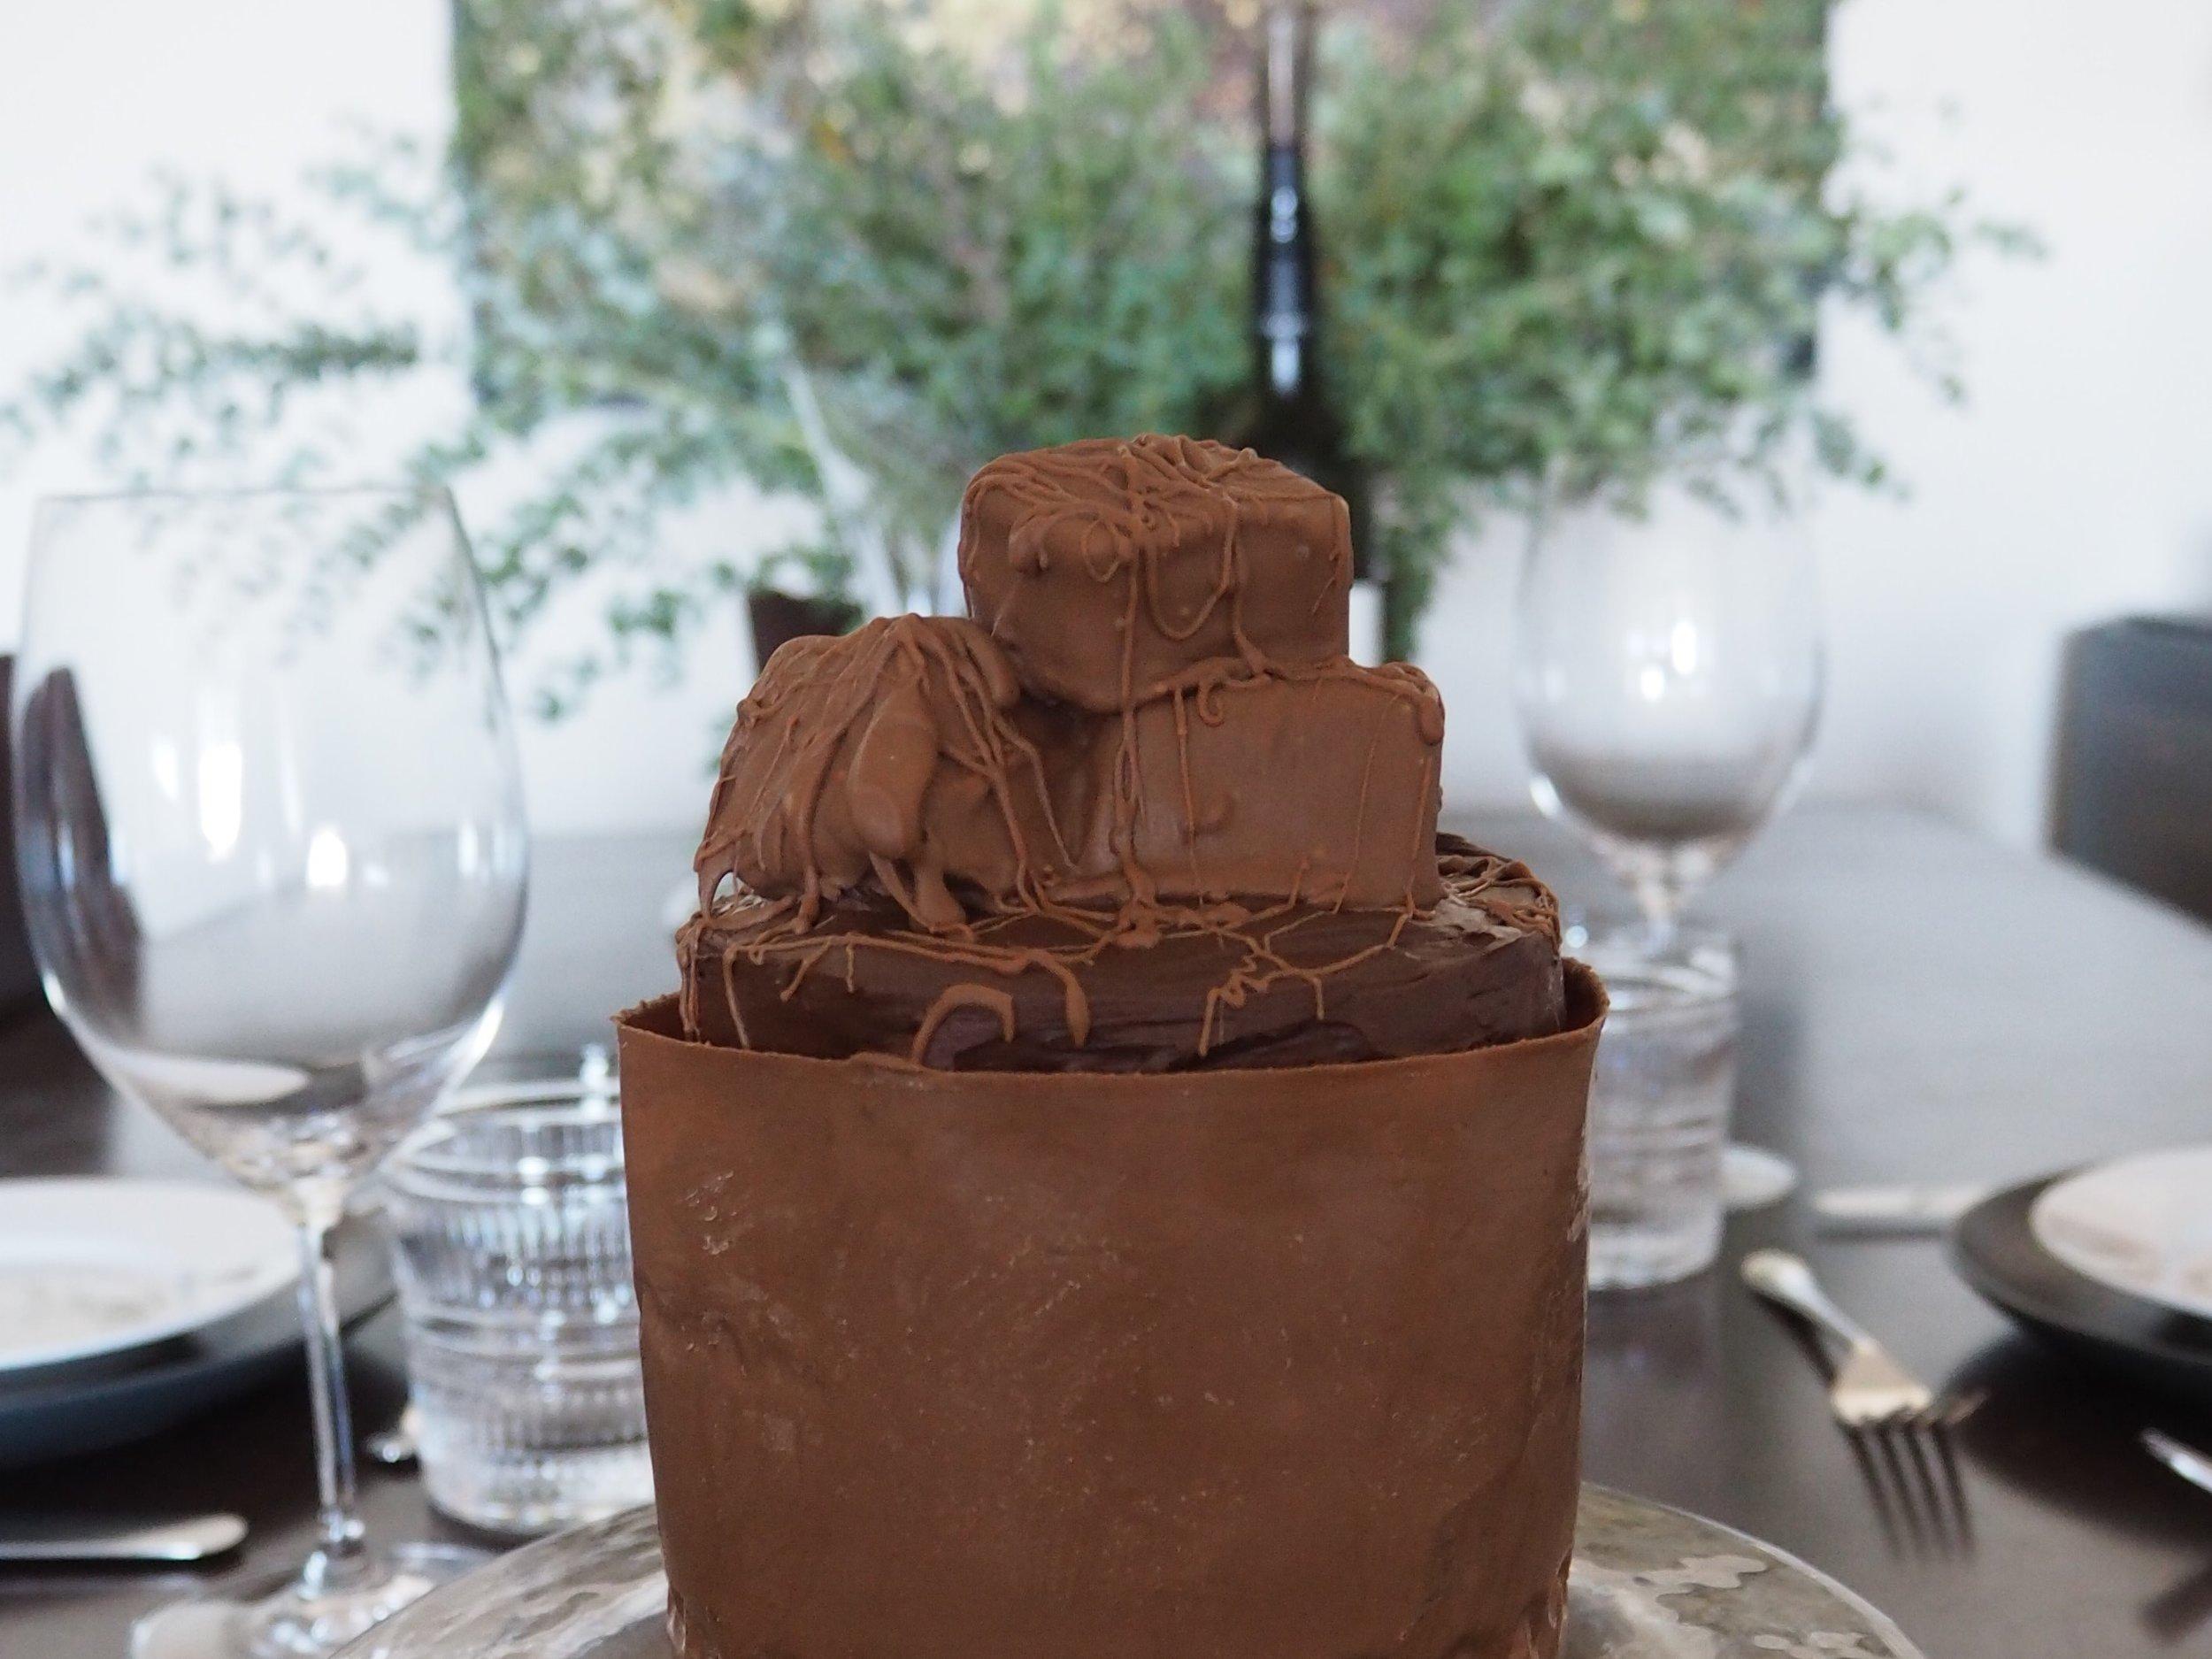 Turkish delight cake up close